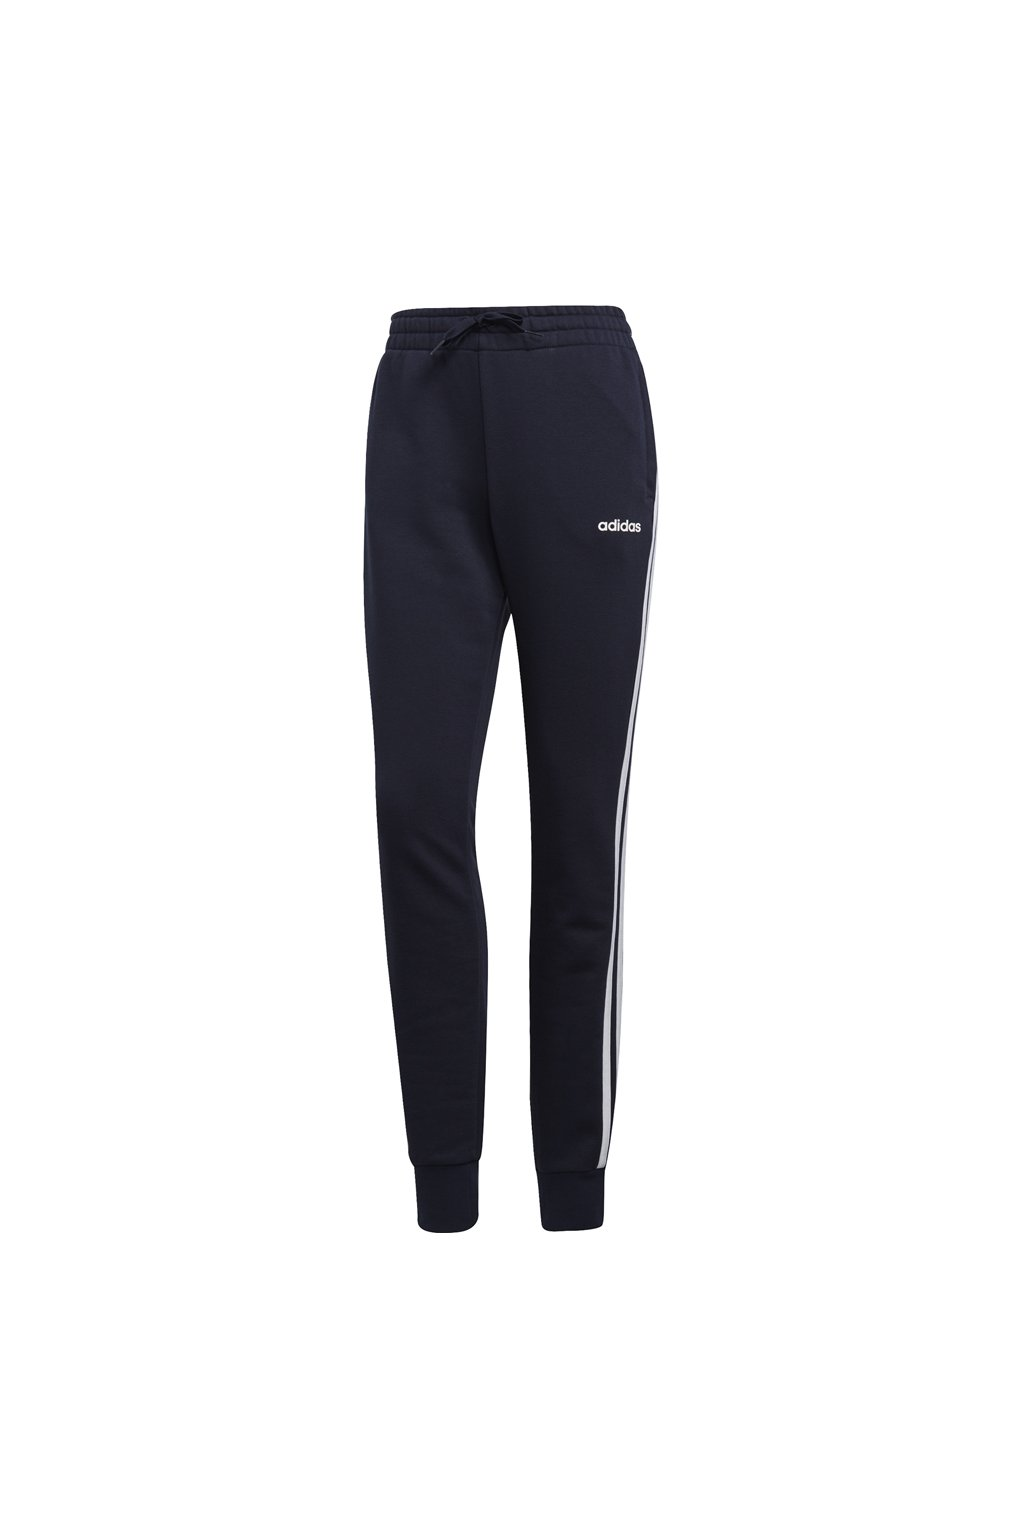 Adidas dámske tepláky W Essentials 3S Pant DU0687